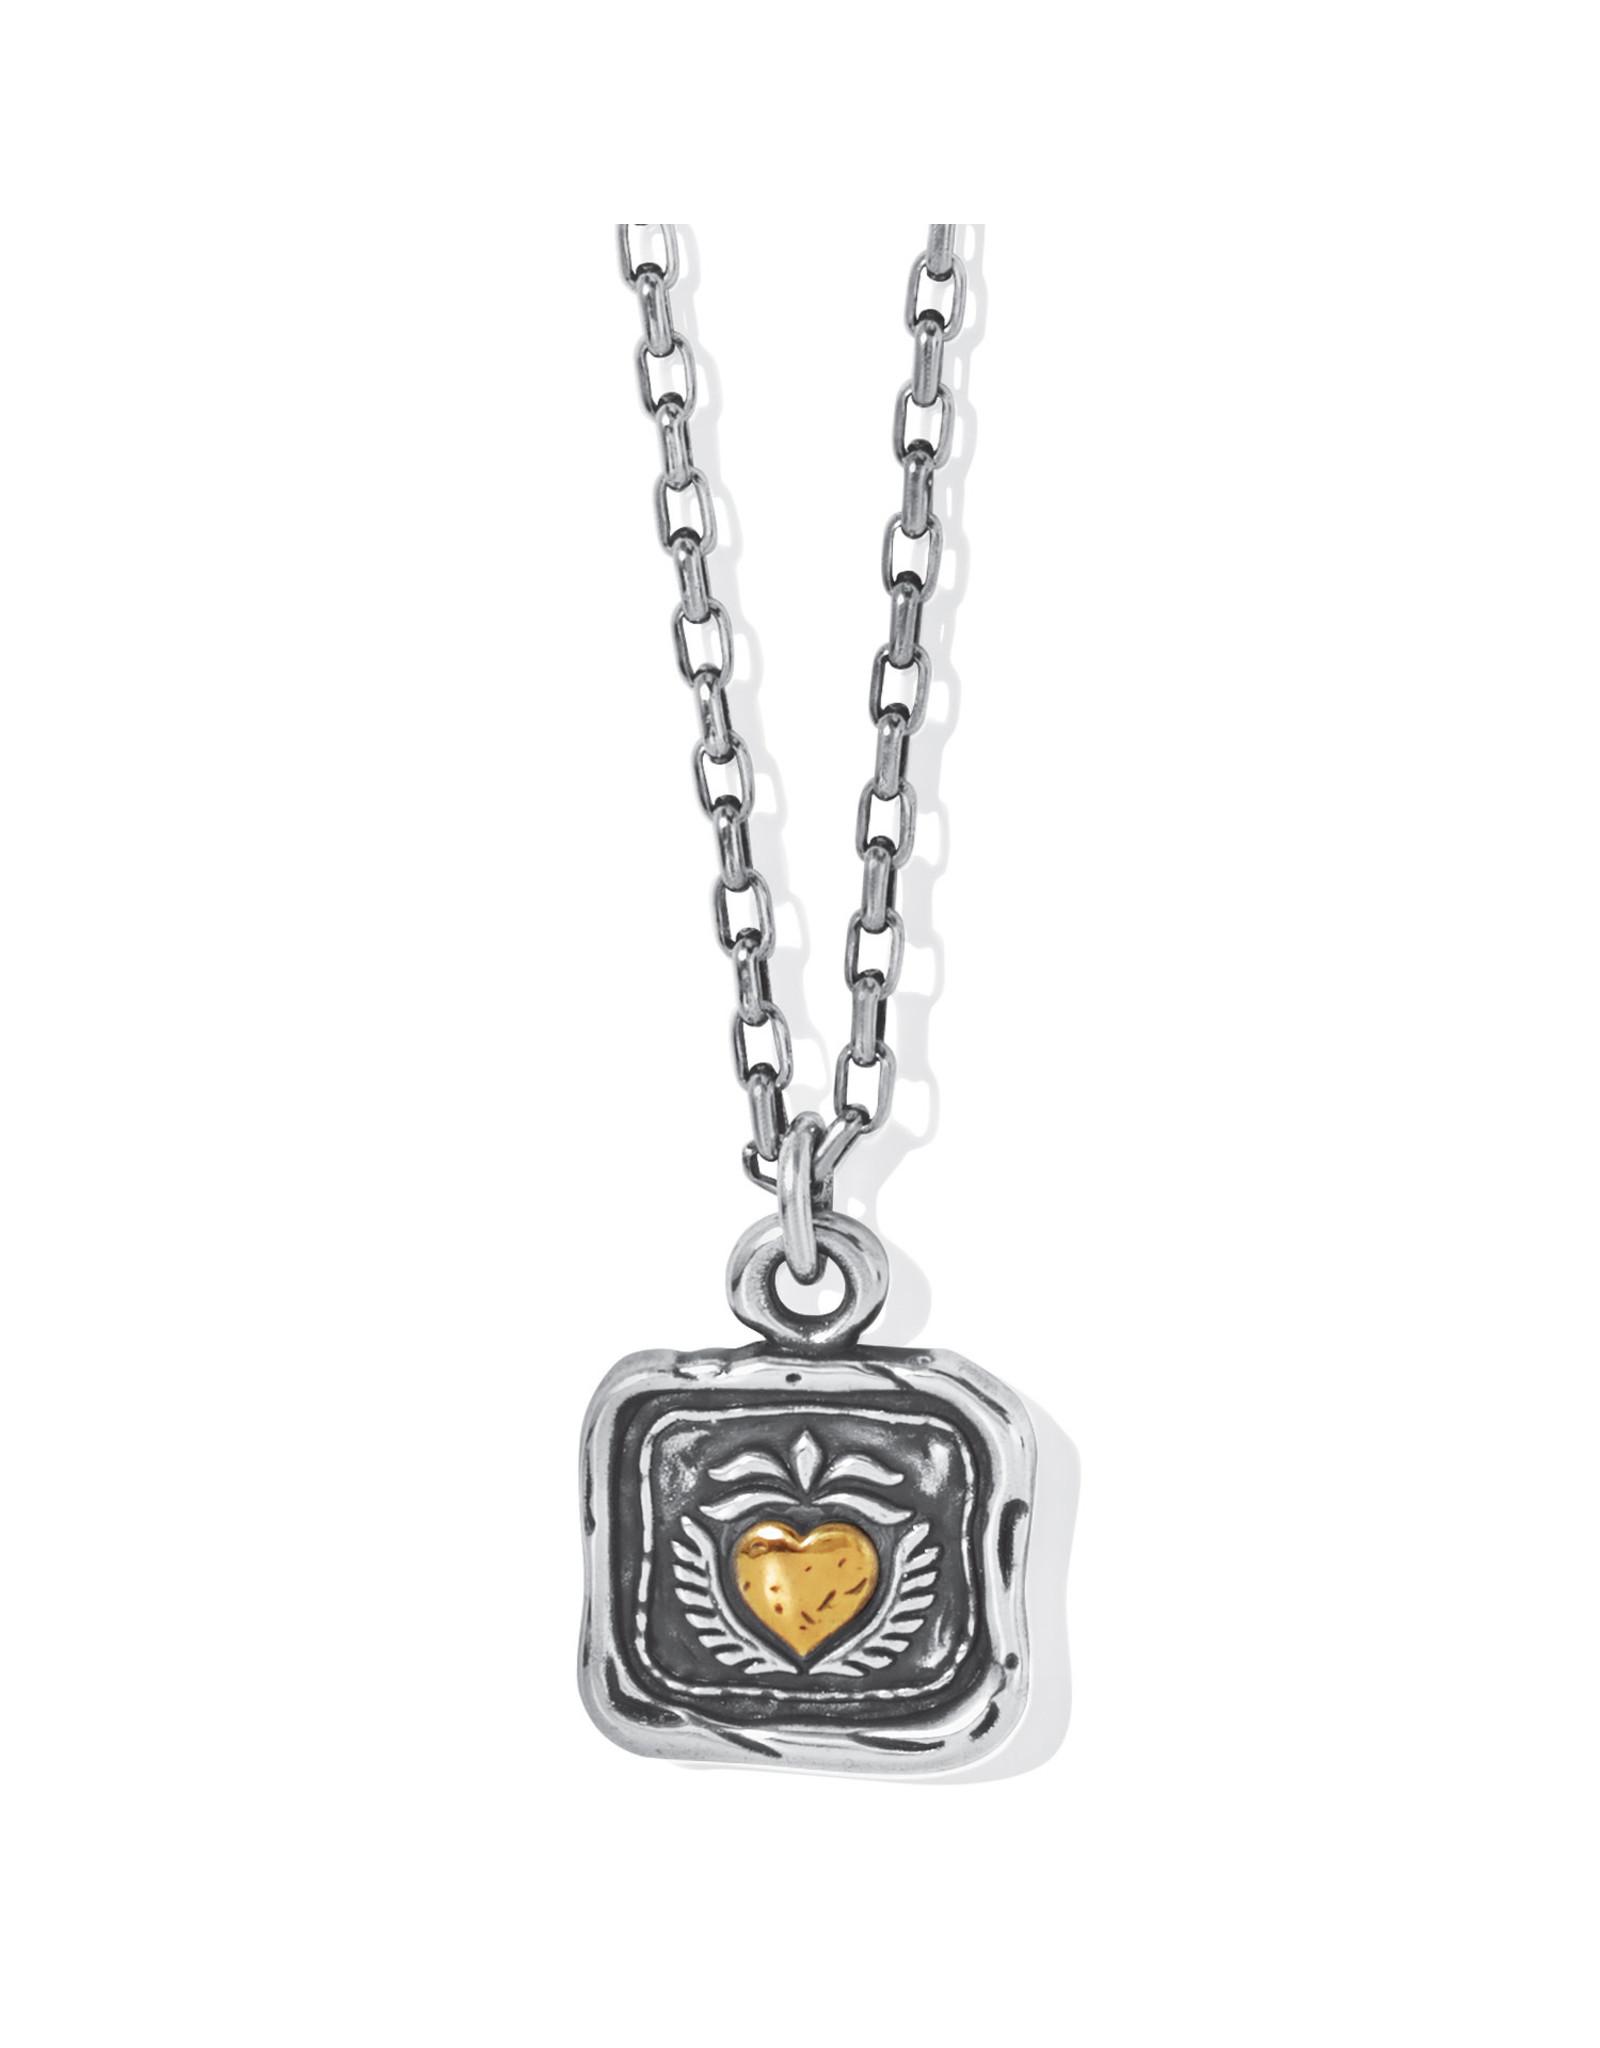 Brighton Ferrara Virtue Winged Hearted Pendant Necklace